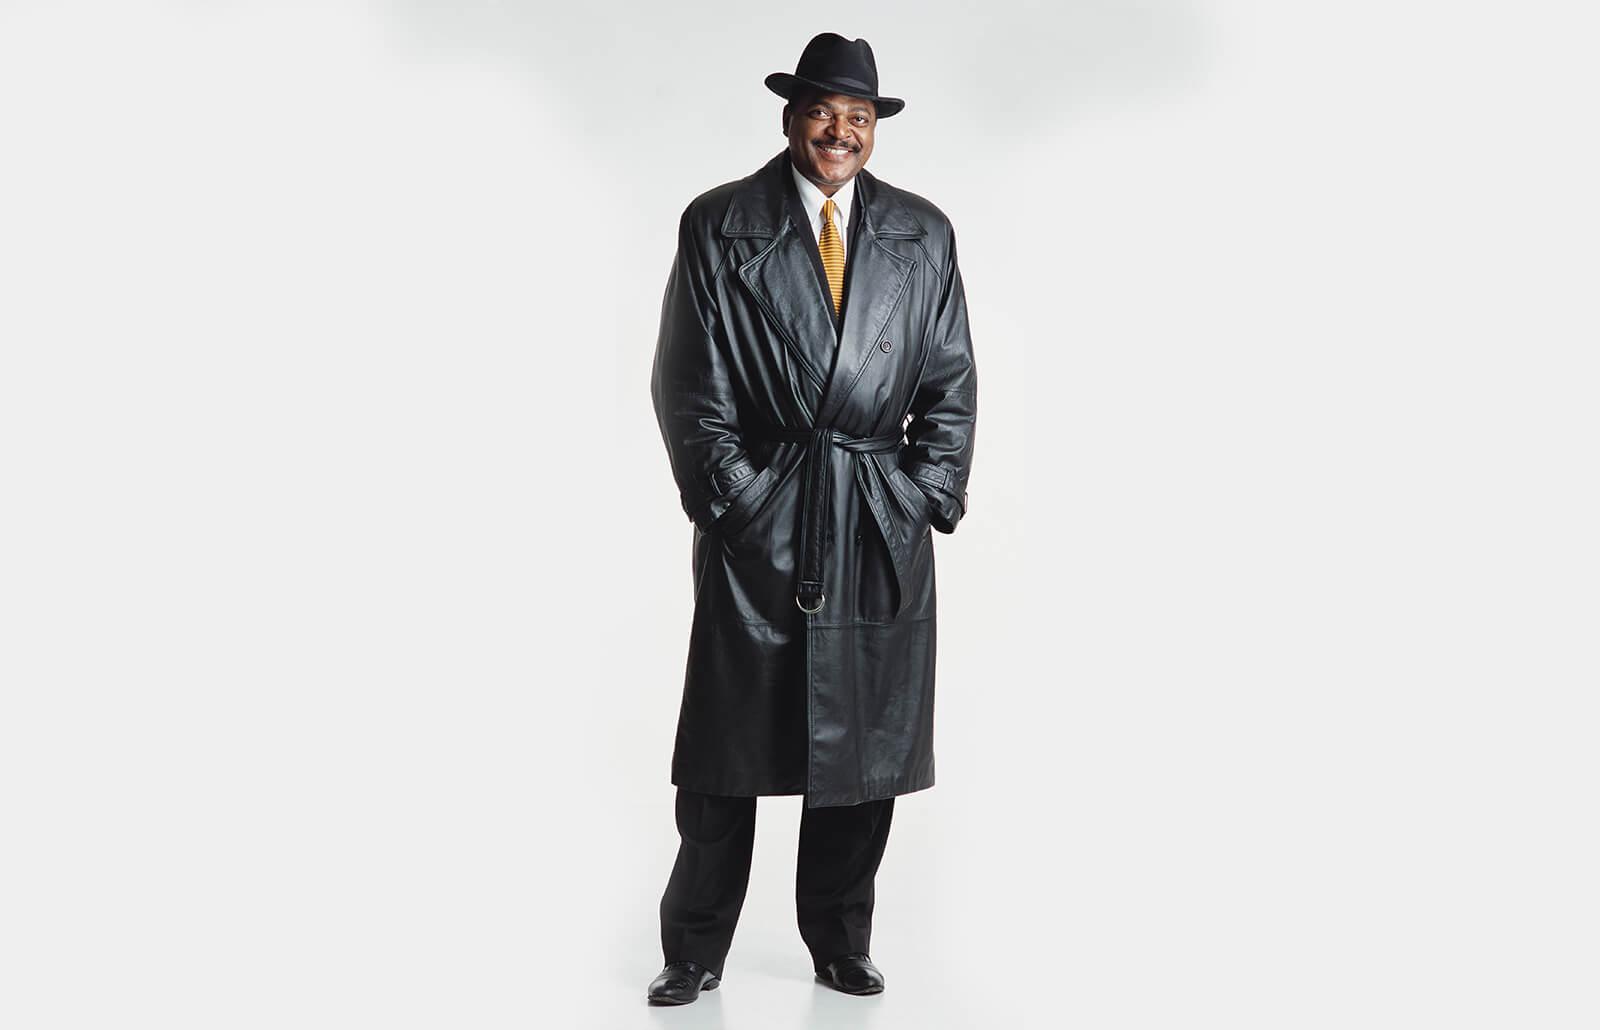 52179d031f1 Shopping Guide for Full-Length Men's Leather Trench Coats | LoveToKnow